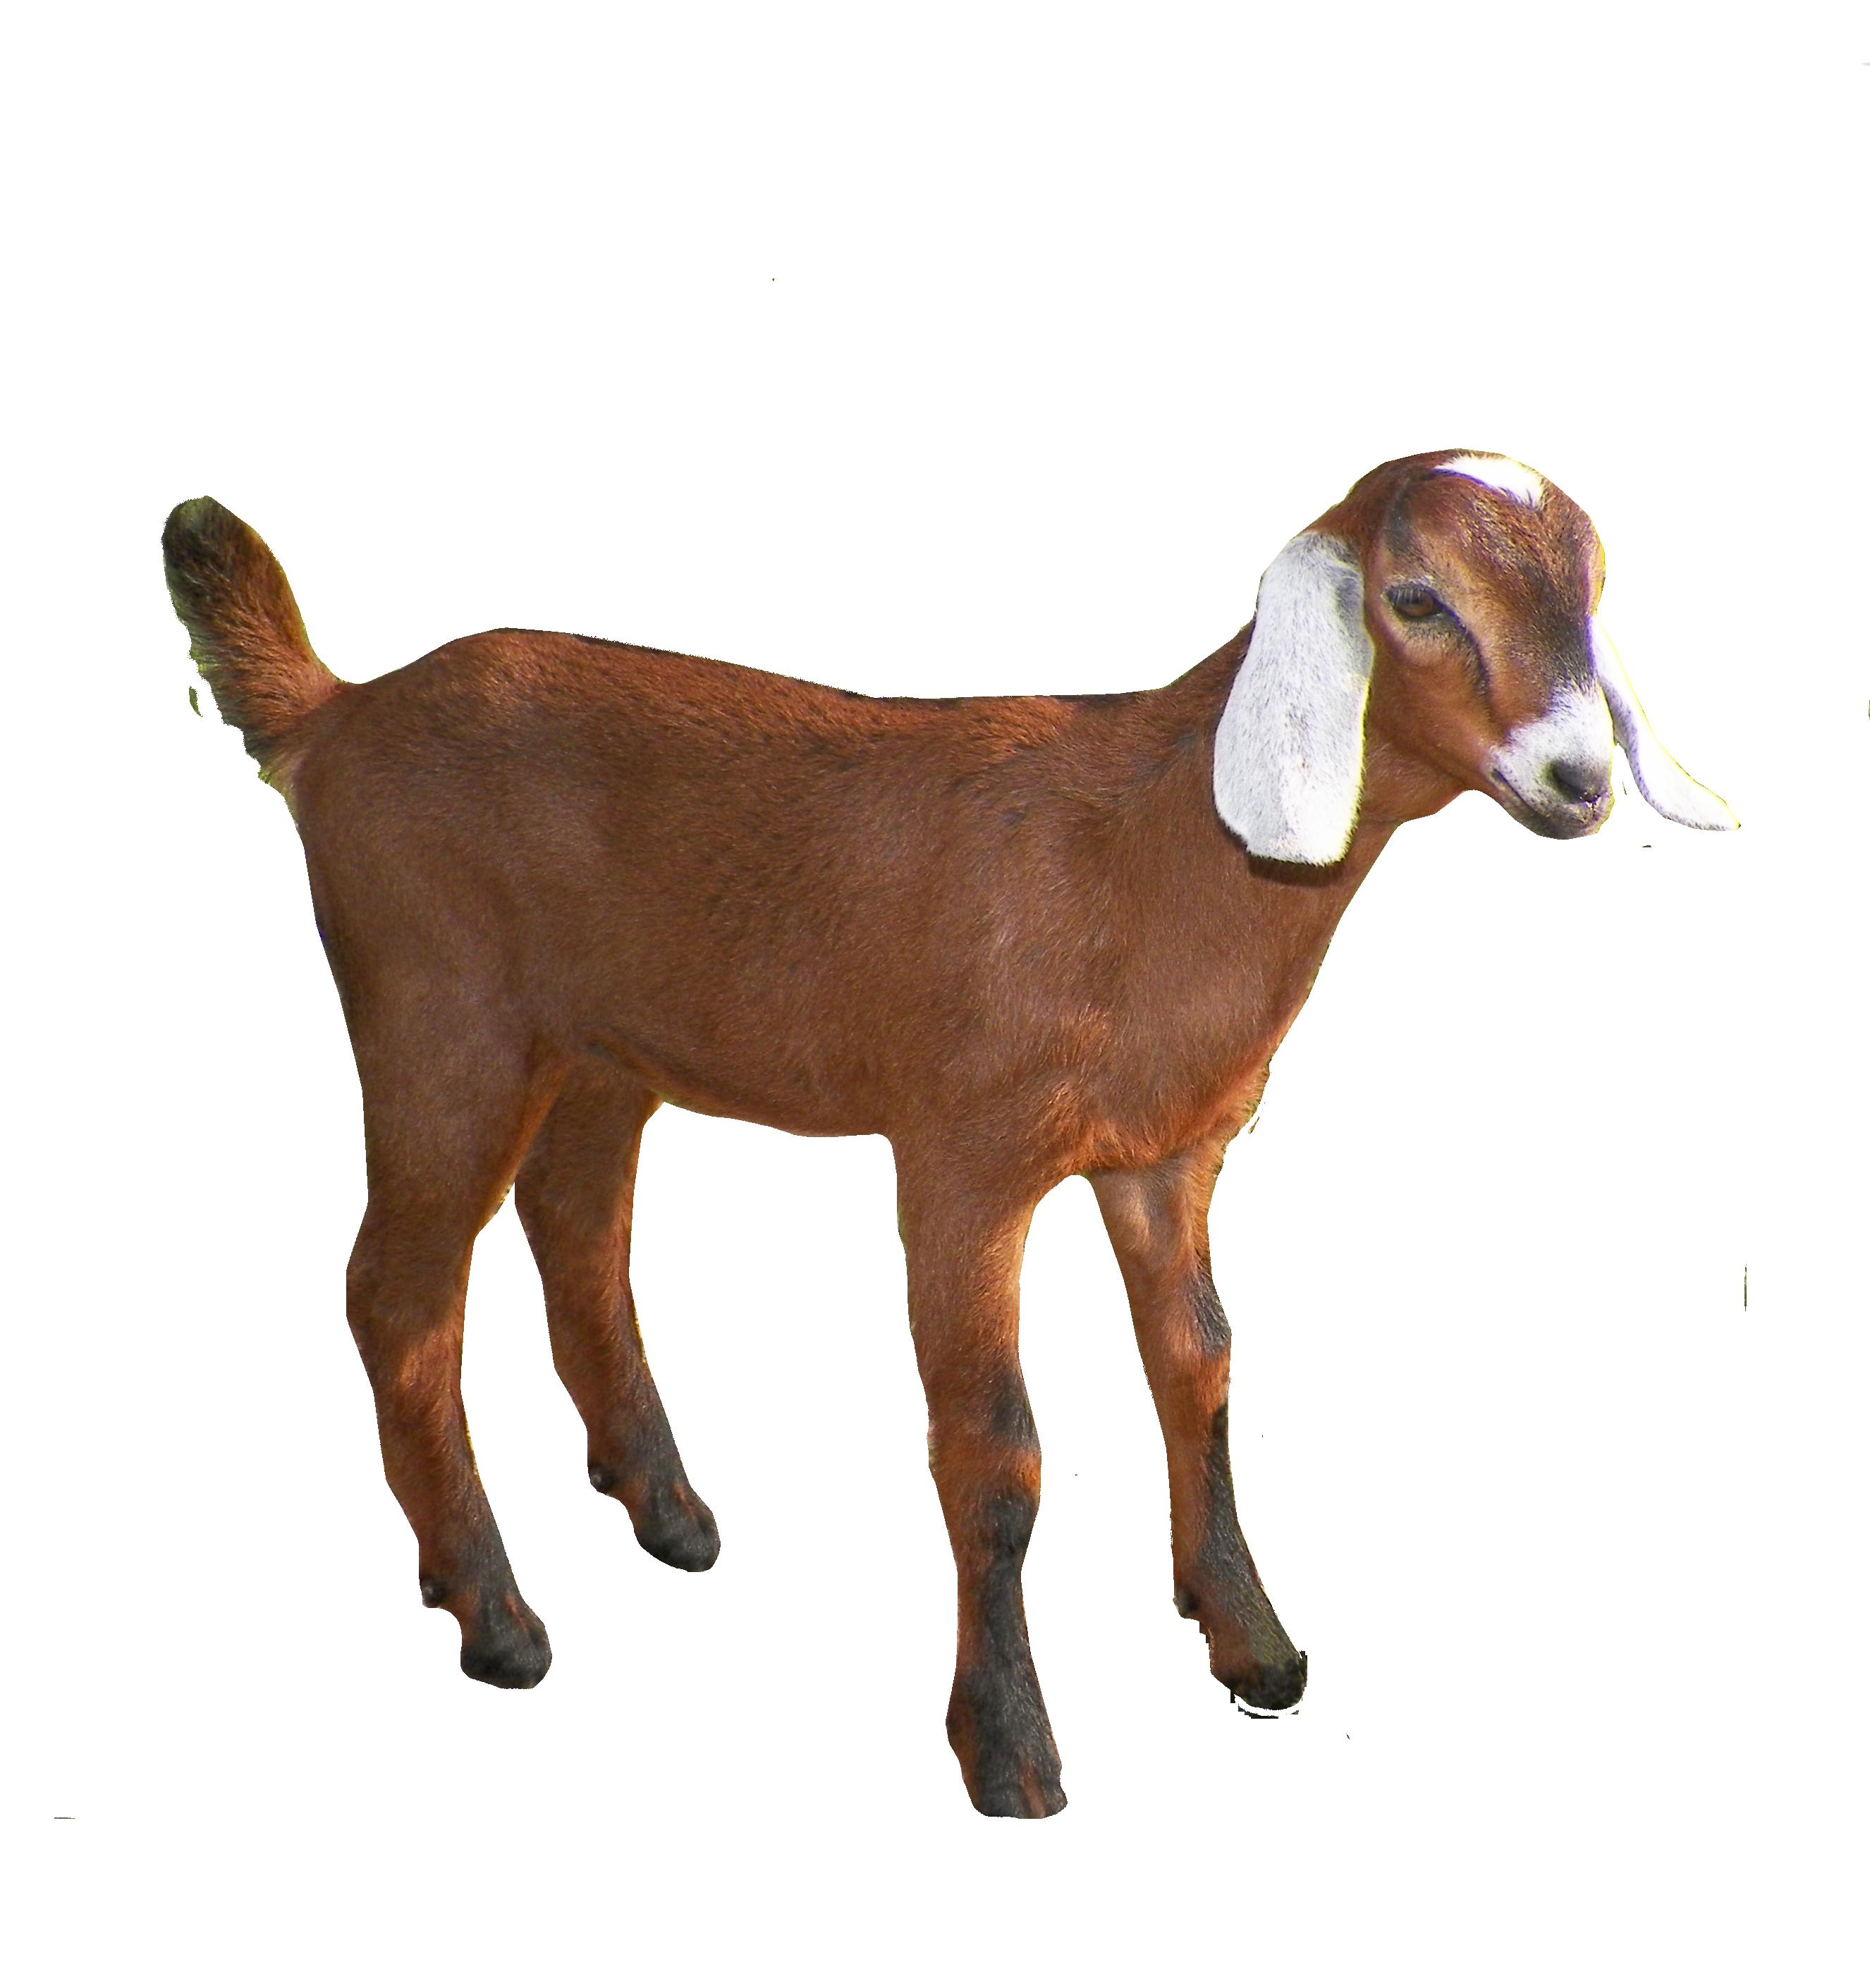 Free PNG Goat - 53108